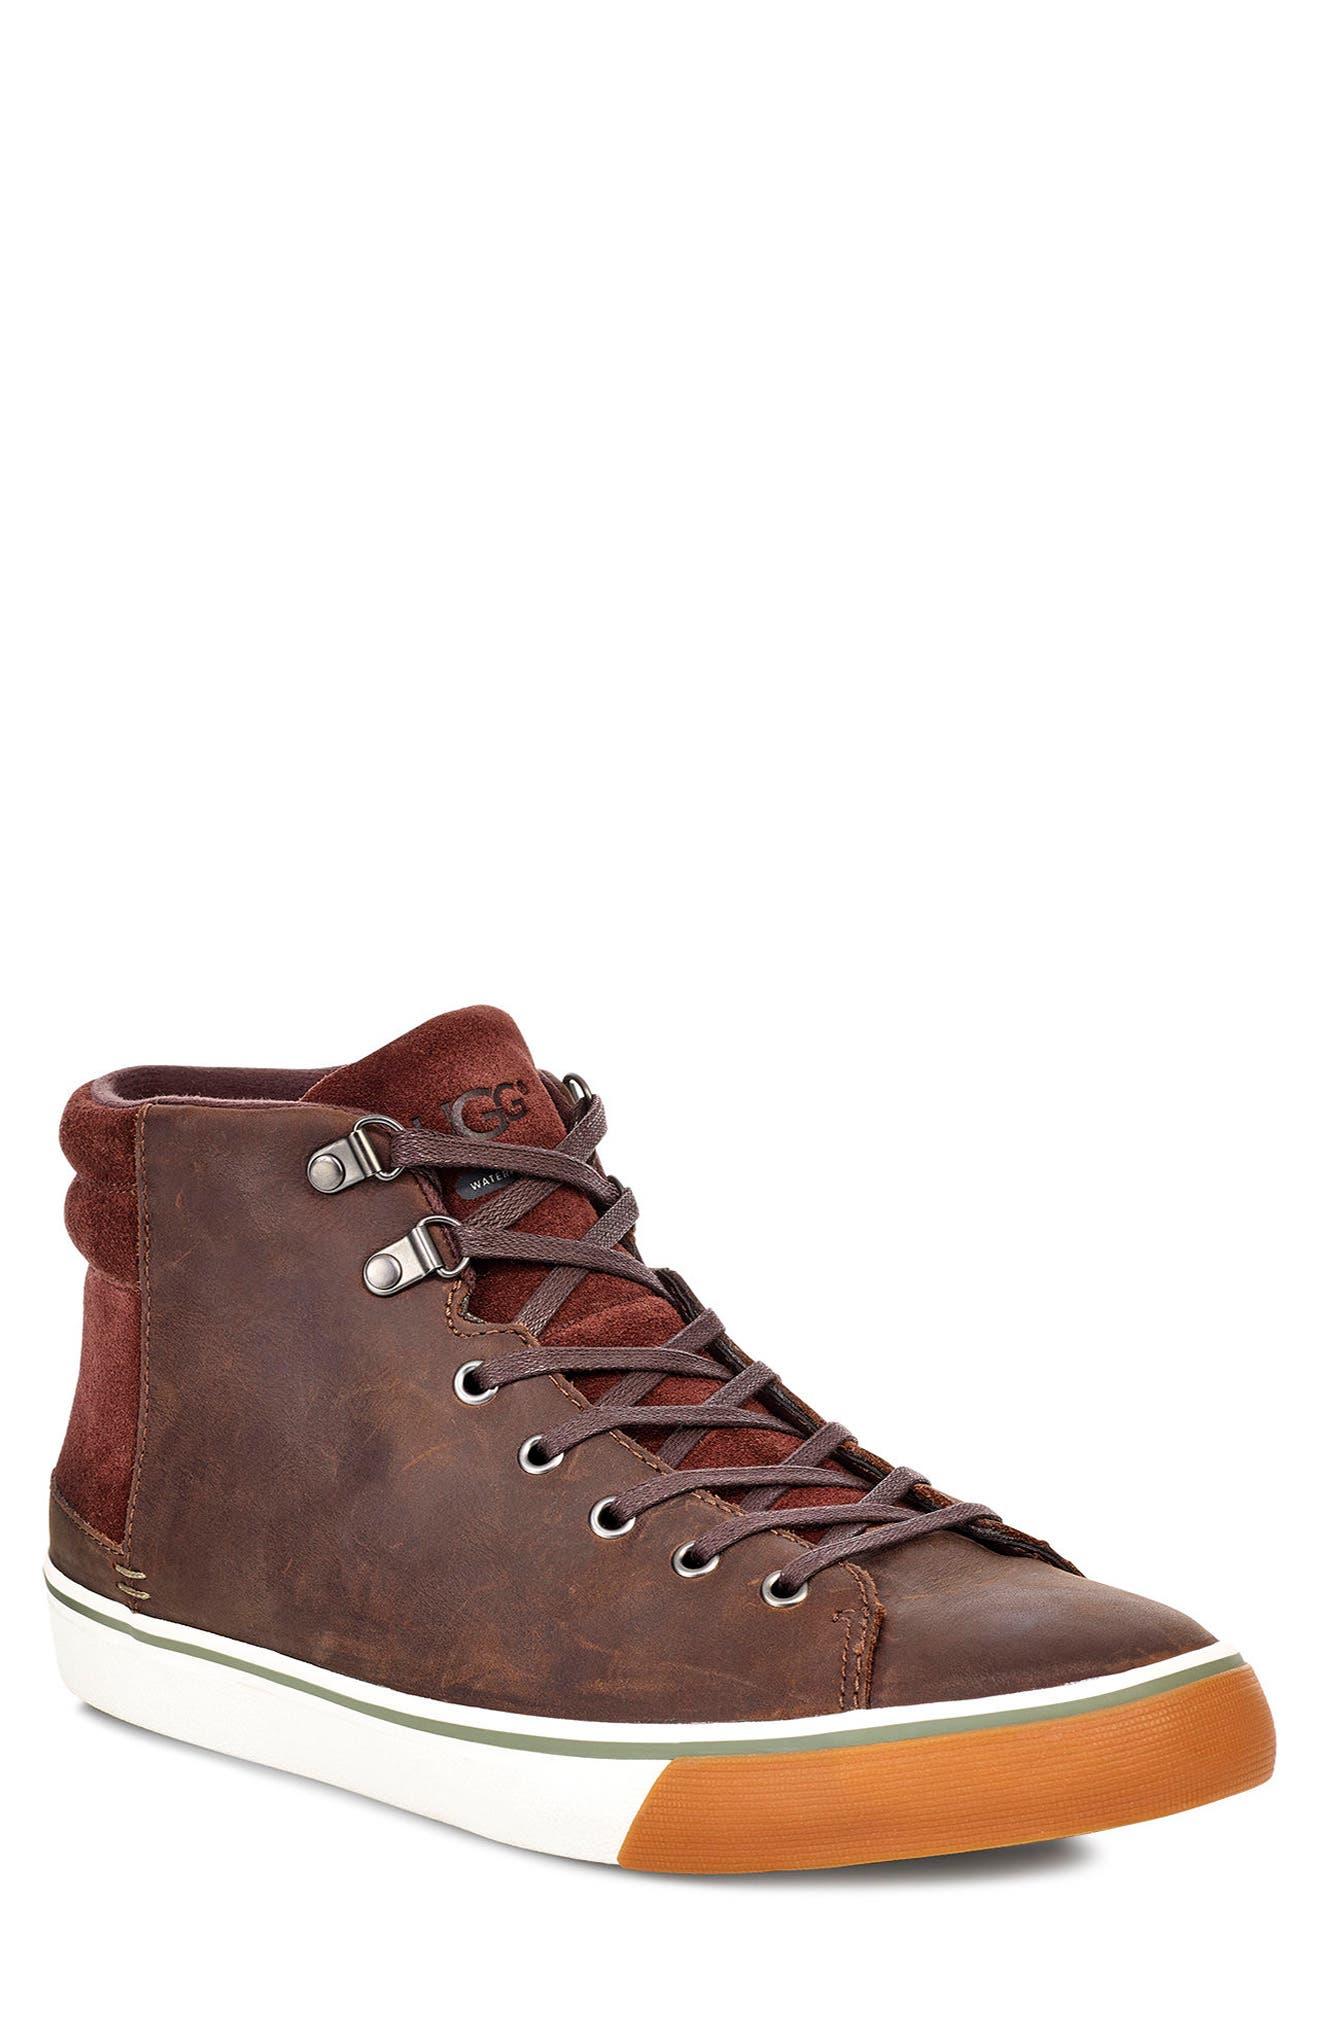 Hoyt II Waterproof Sneaker, Main, color, GRIZZLY